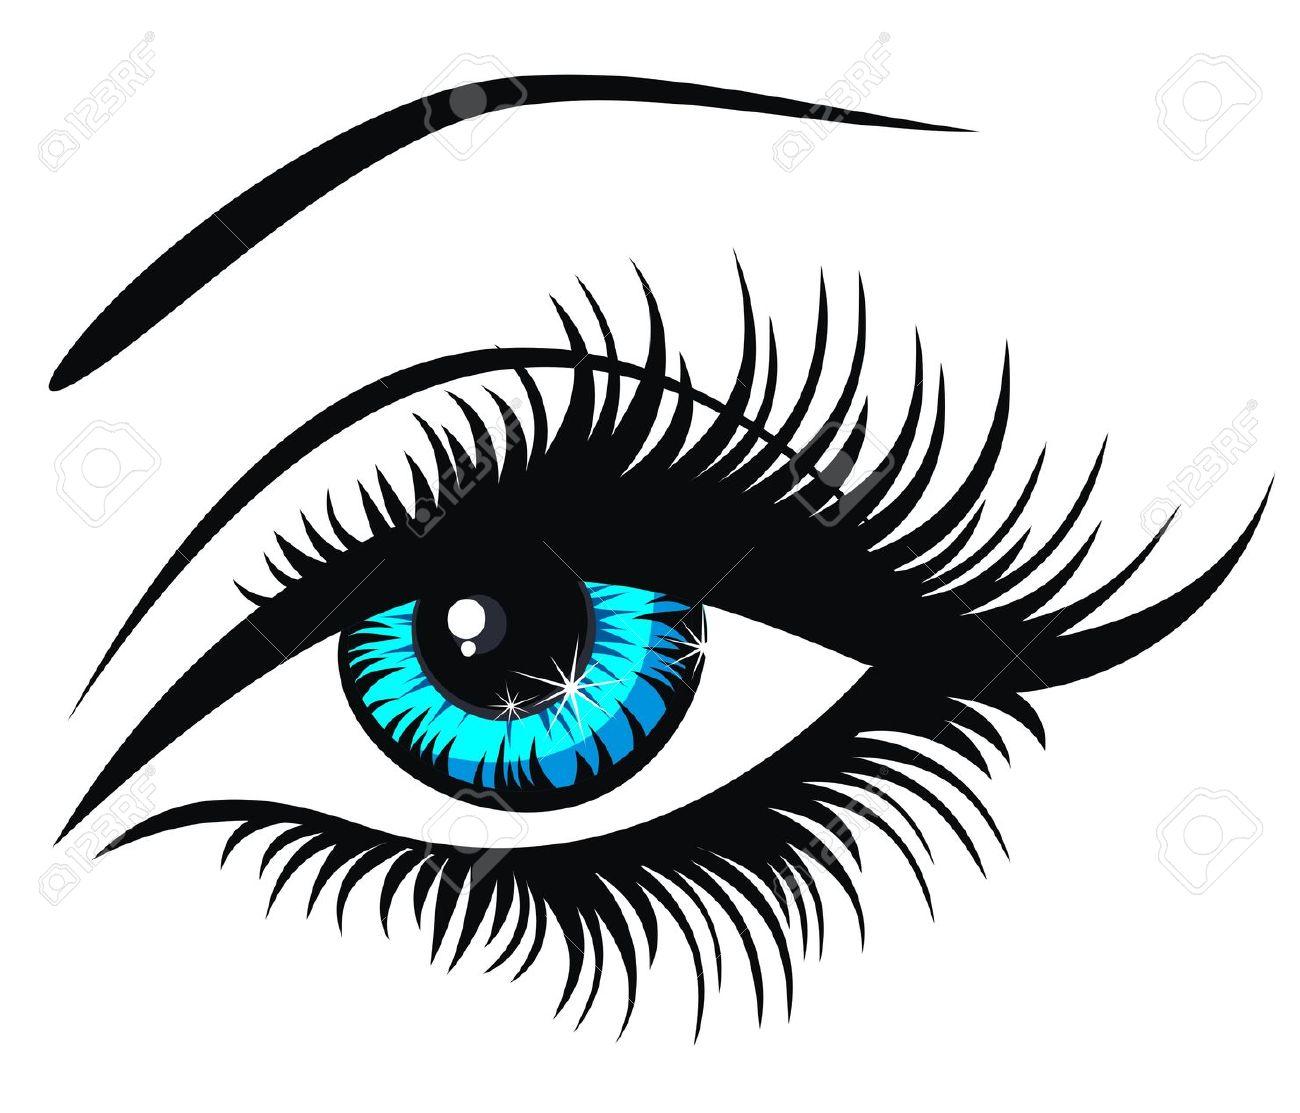 Eyelash logo clipart clip art library download Eyelashes Clipart | Free download best Eyelashes Clipart on ... clip art library download